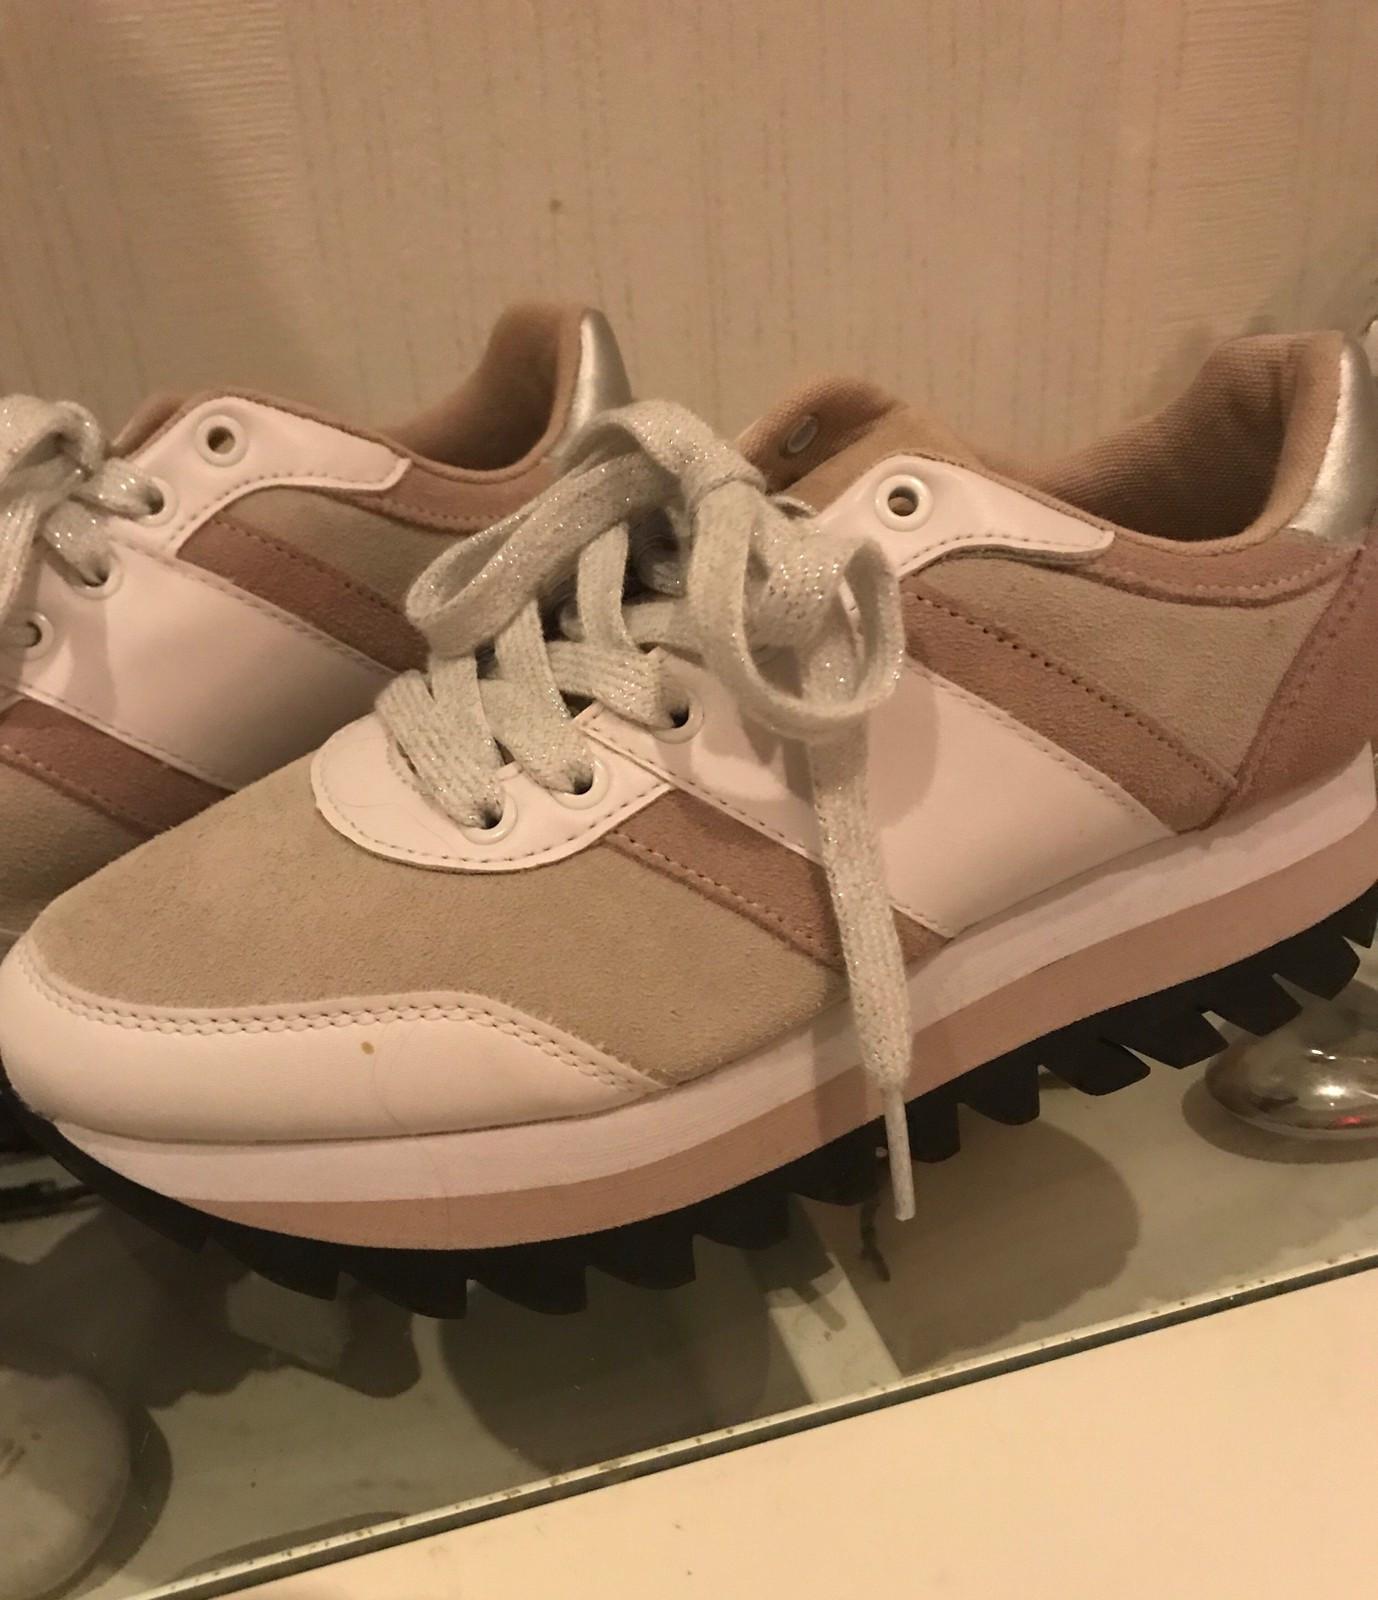 Nye sko fra Zara | FINN.no